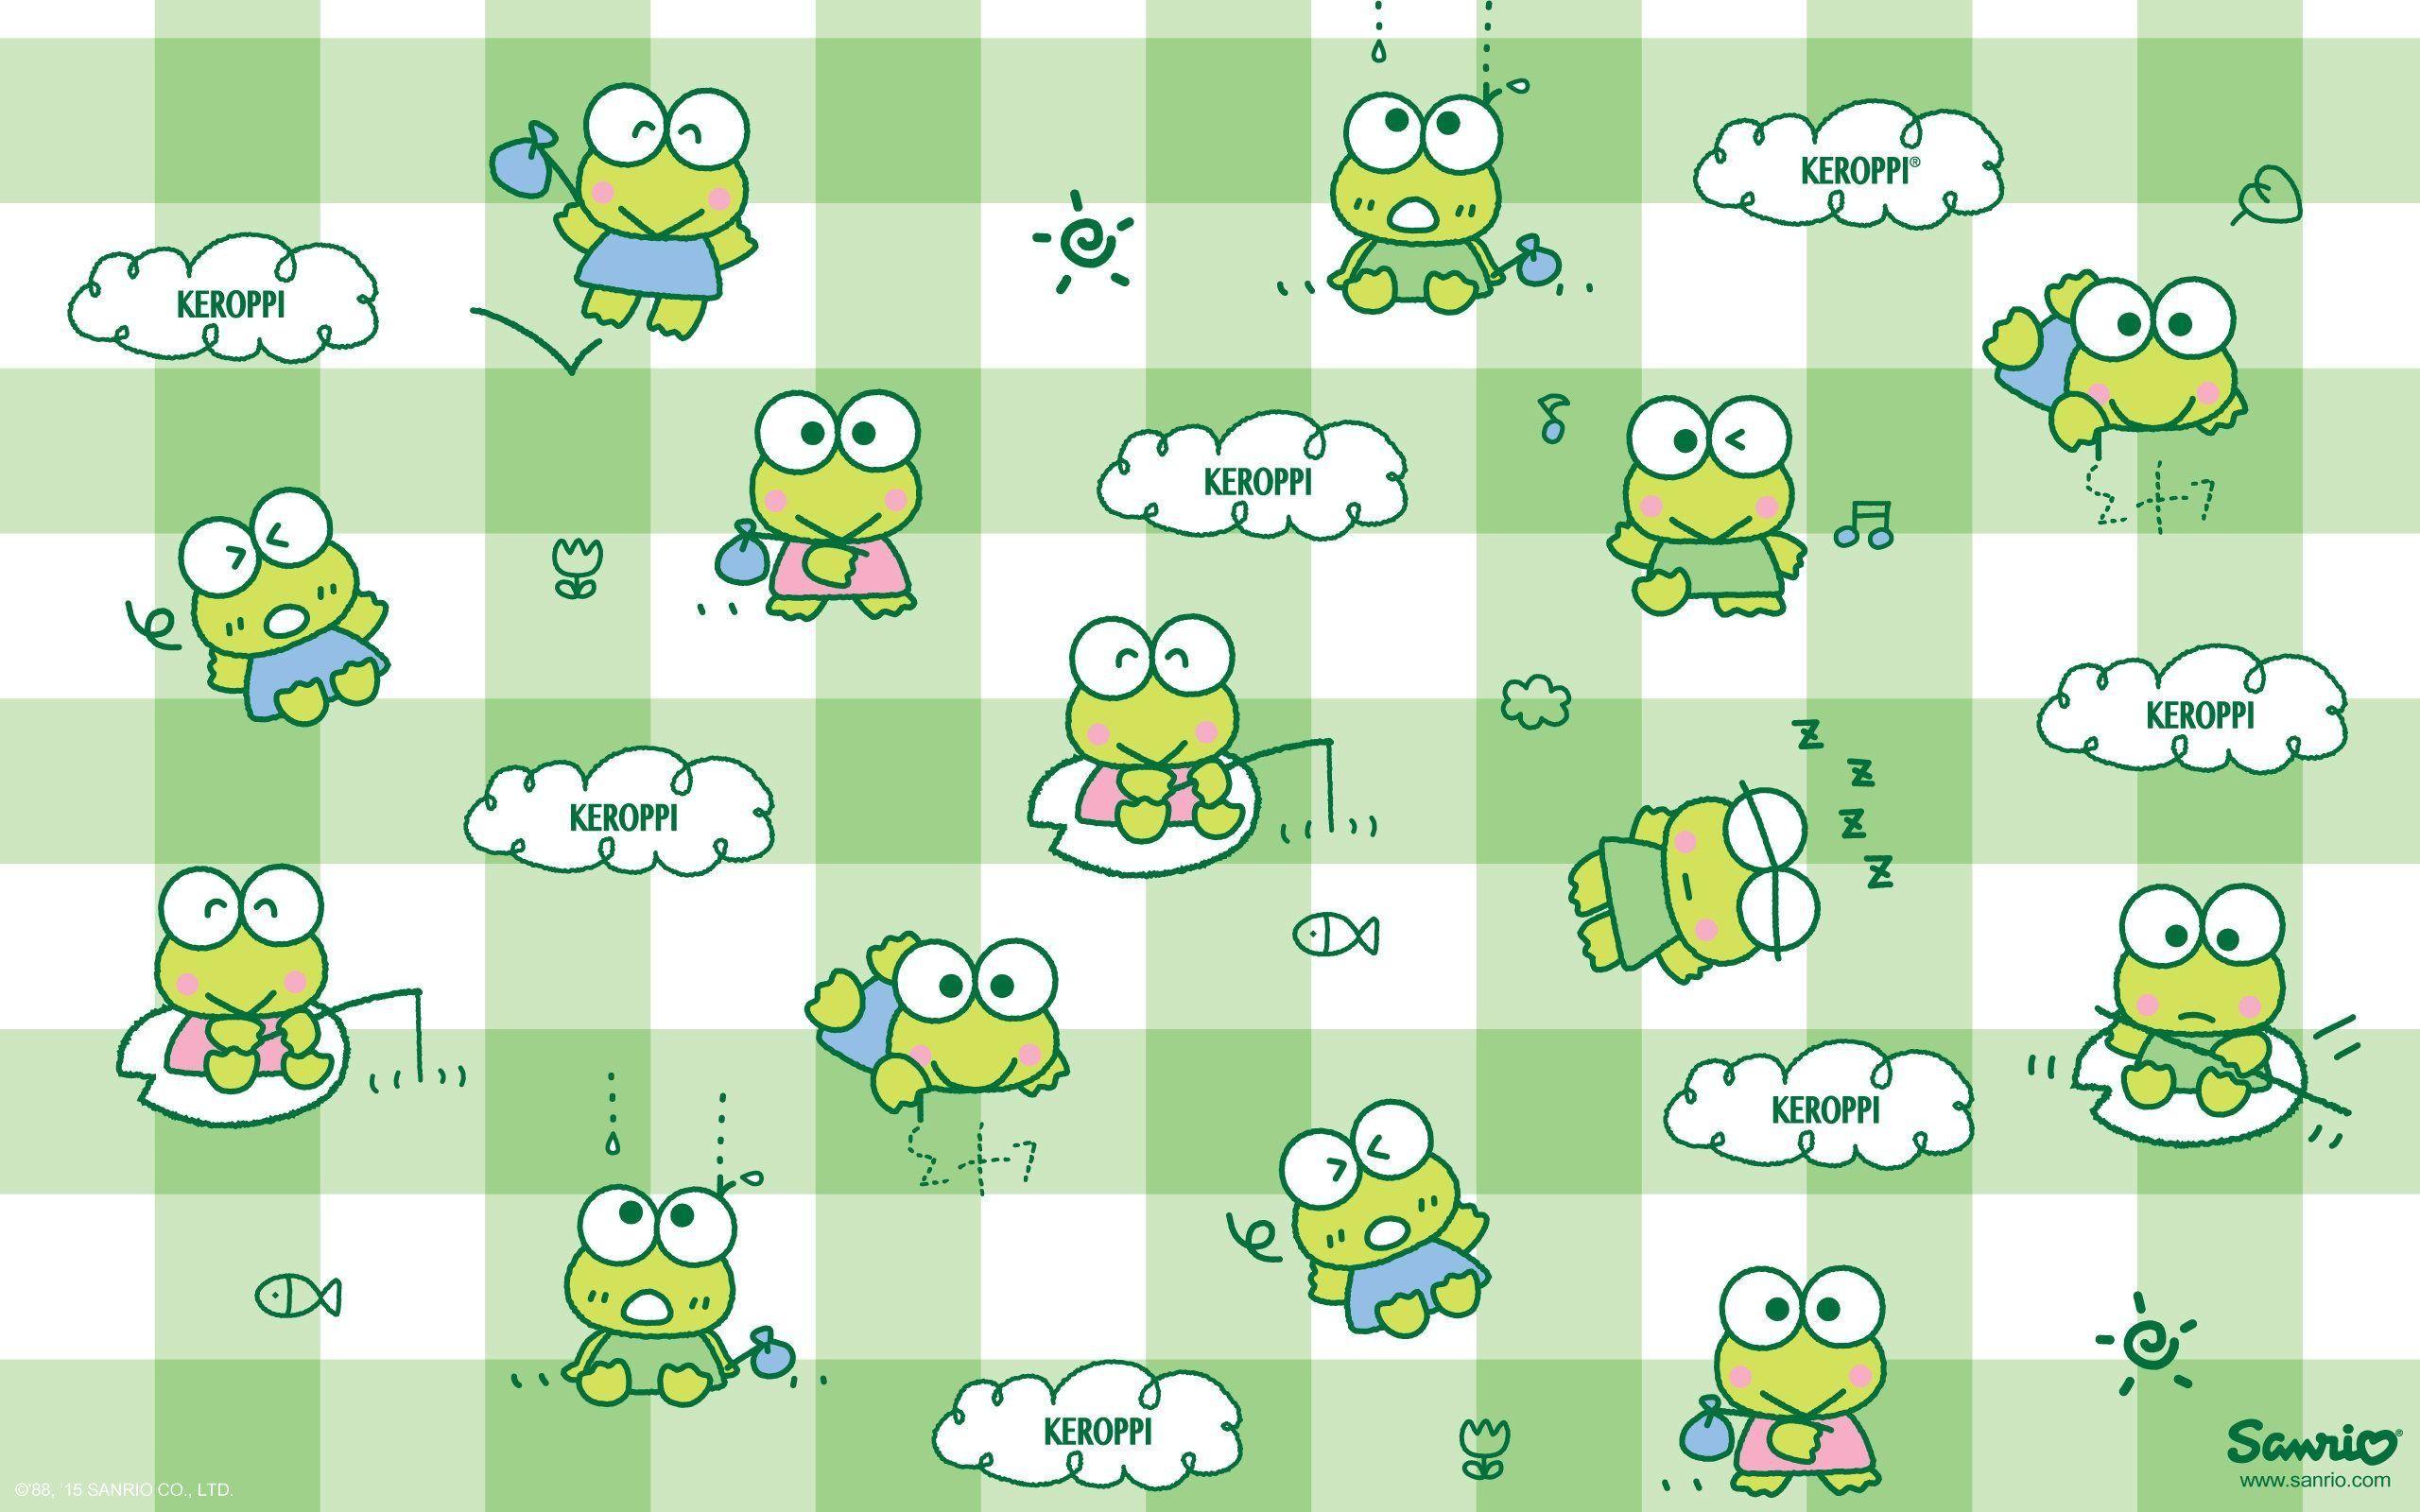 Cute Kitty Wallpapers Download Cute Keroppi Wallpaper 183 ①